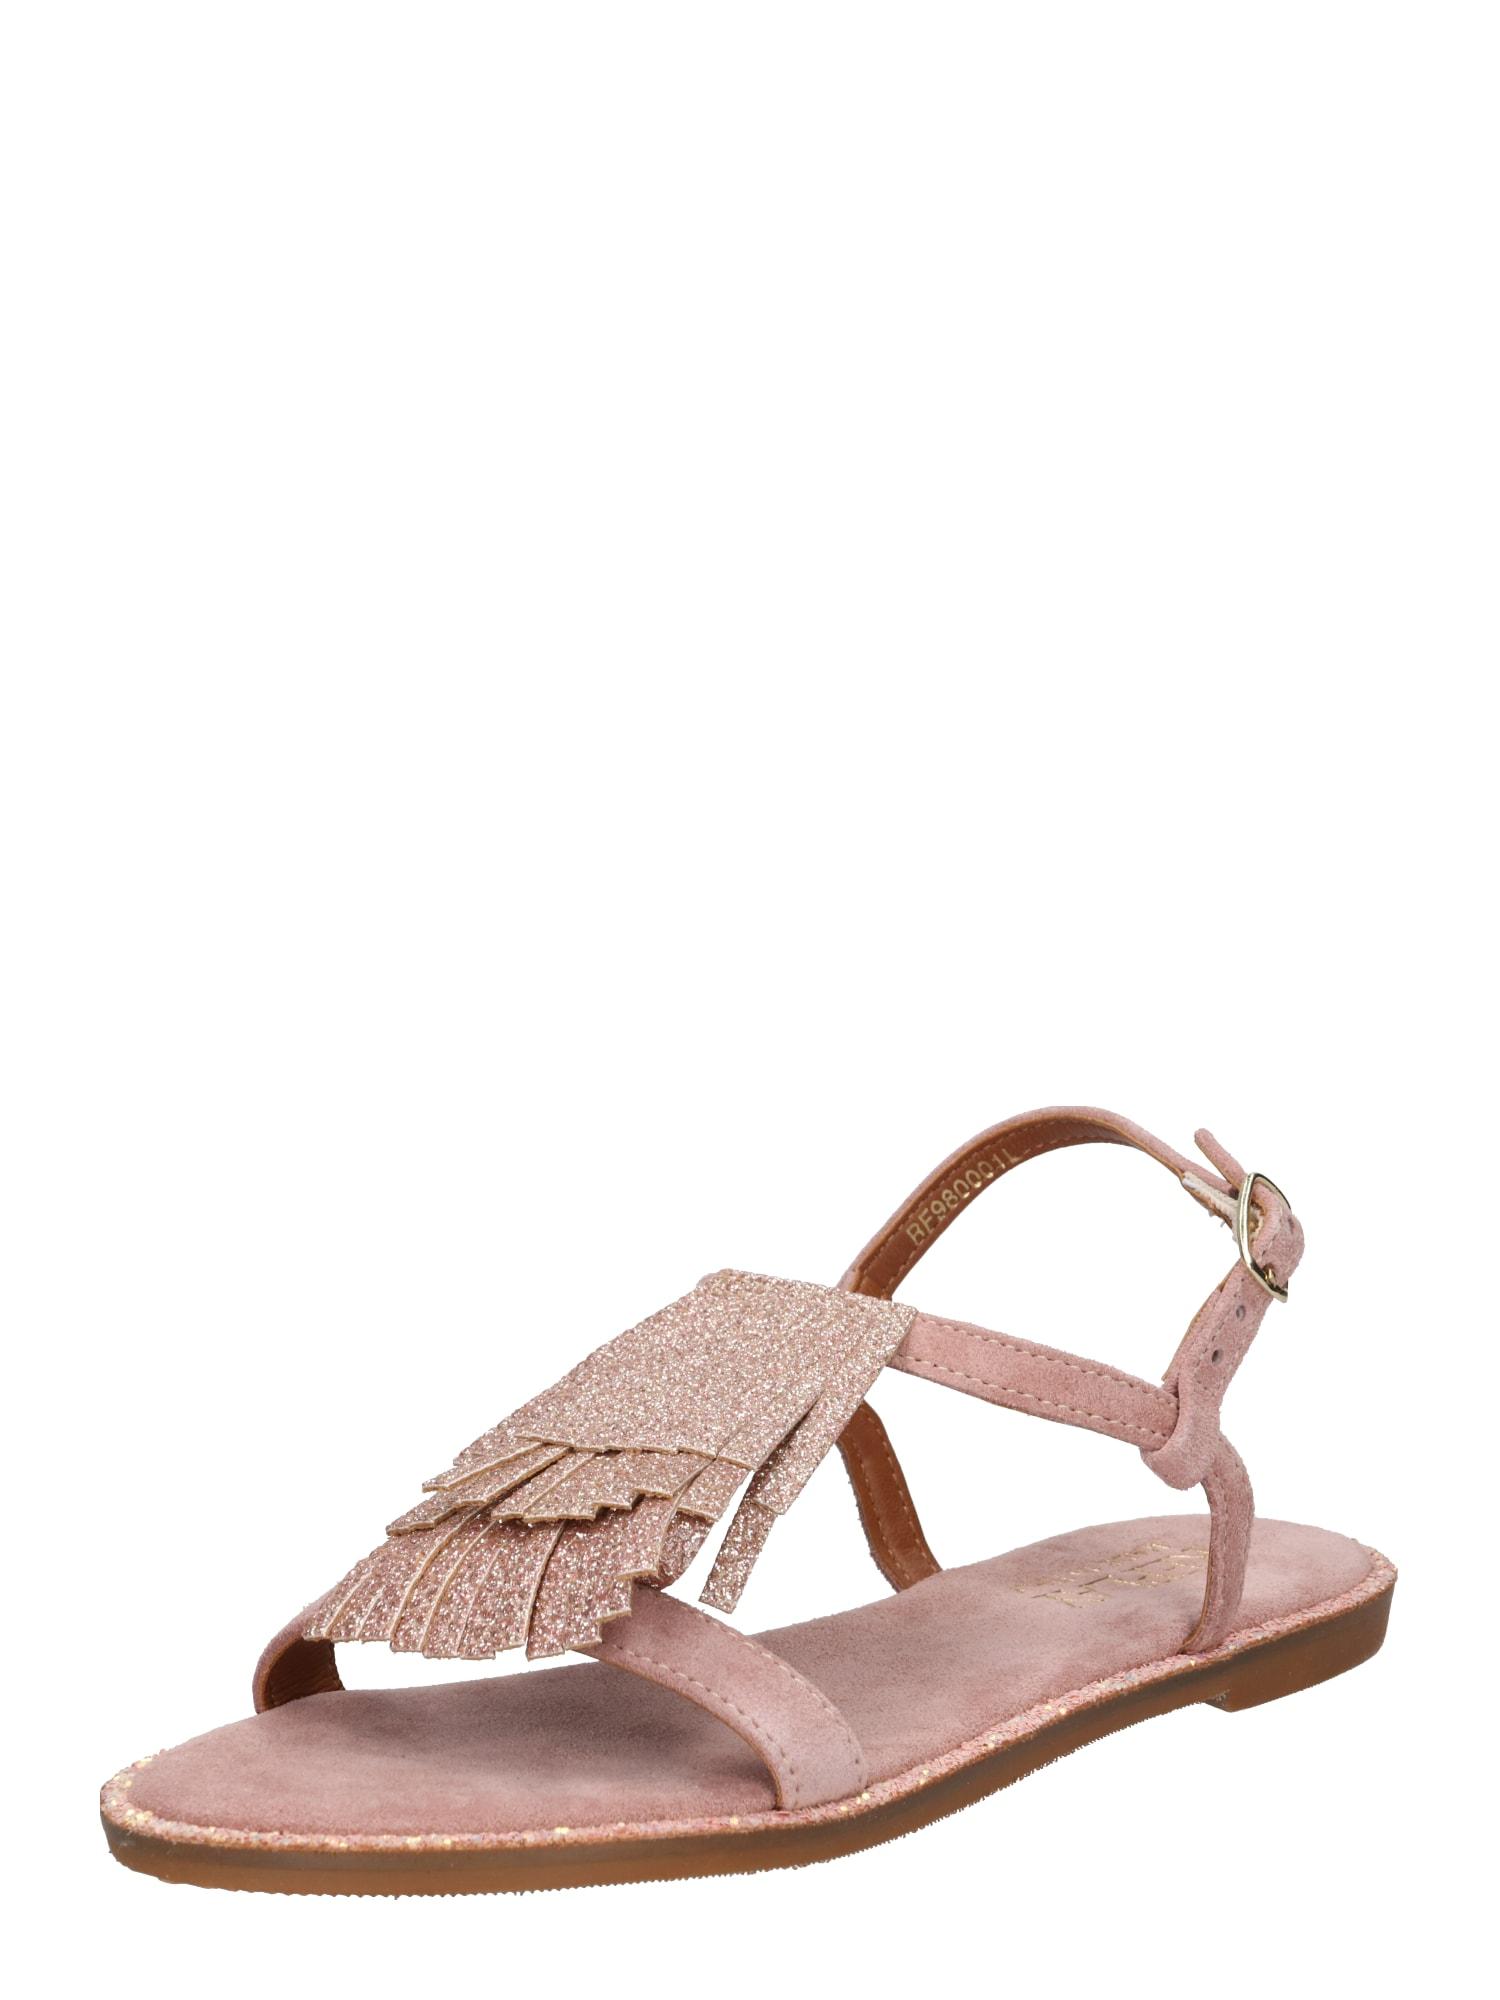 REPLAY Sandale 'Mia'  roz vechi